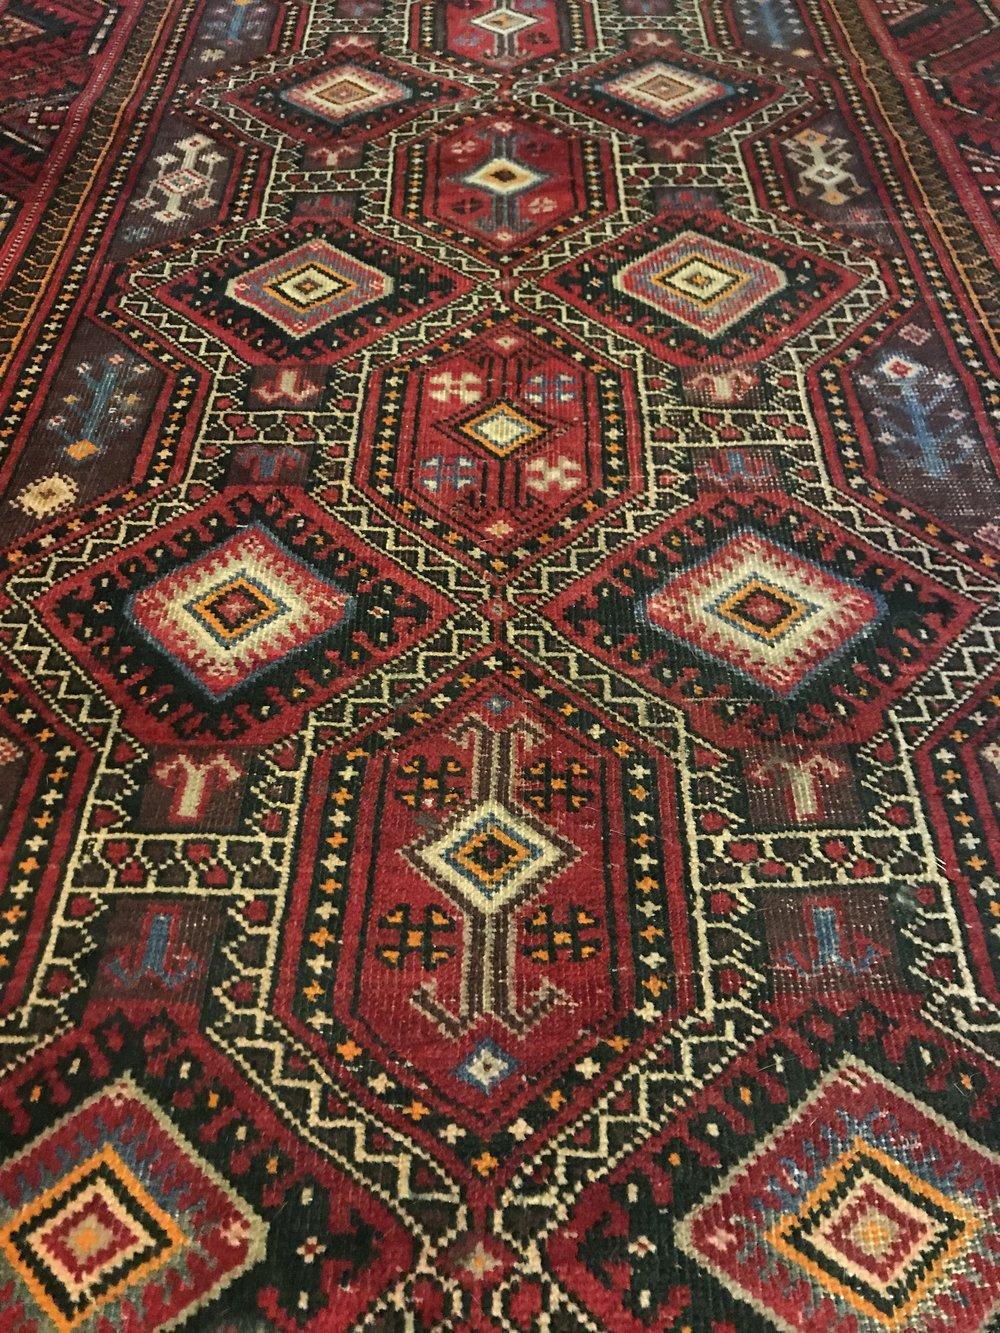 rug #2 - 4' x 10'